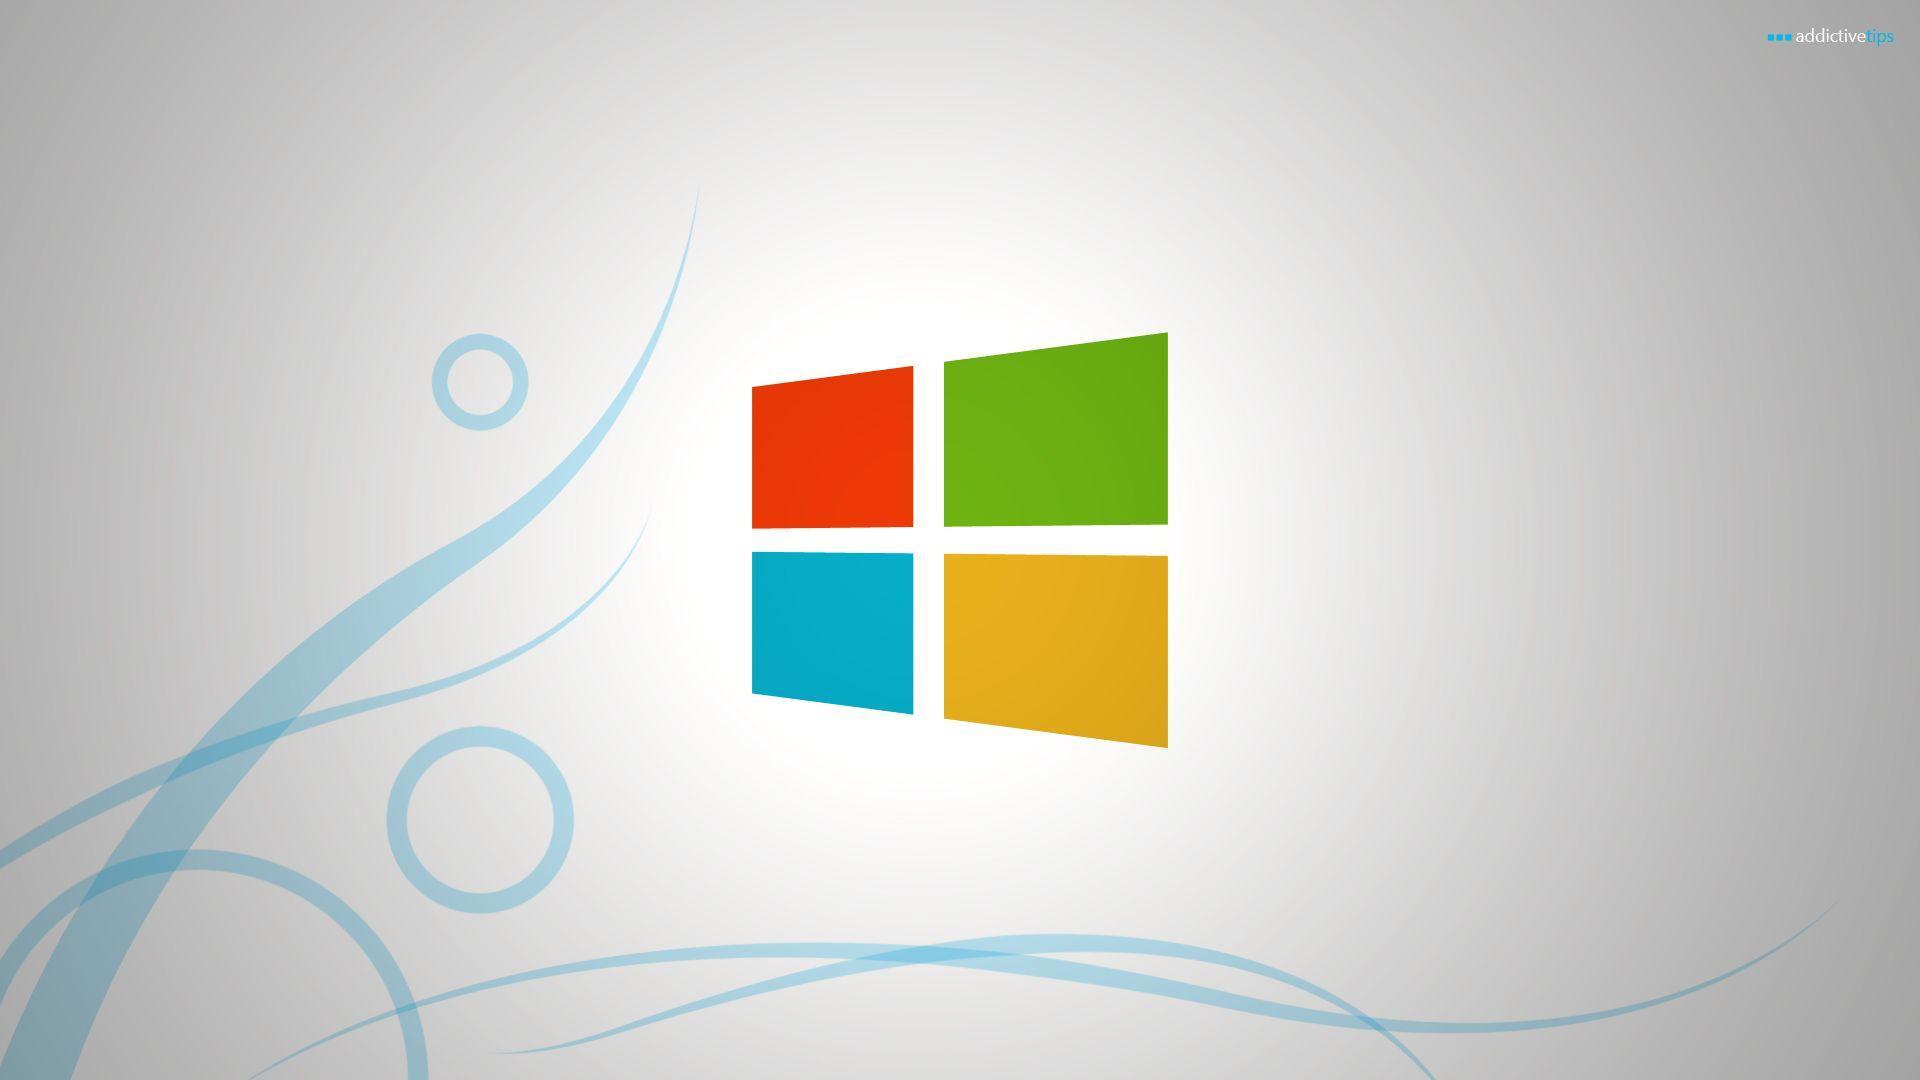 Windows 11 Wallpapers - Wallpaper Cave